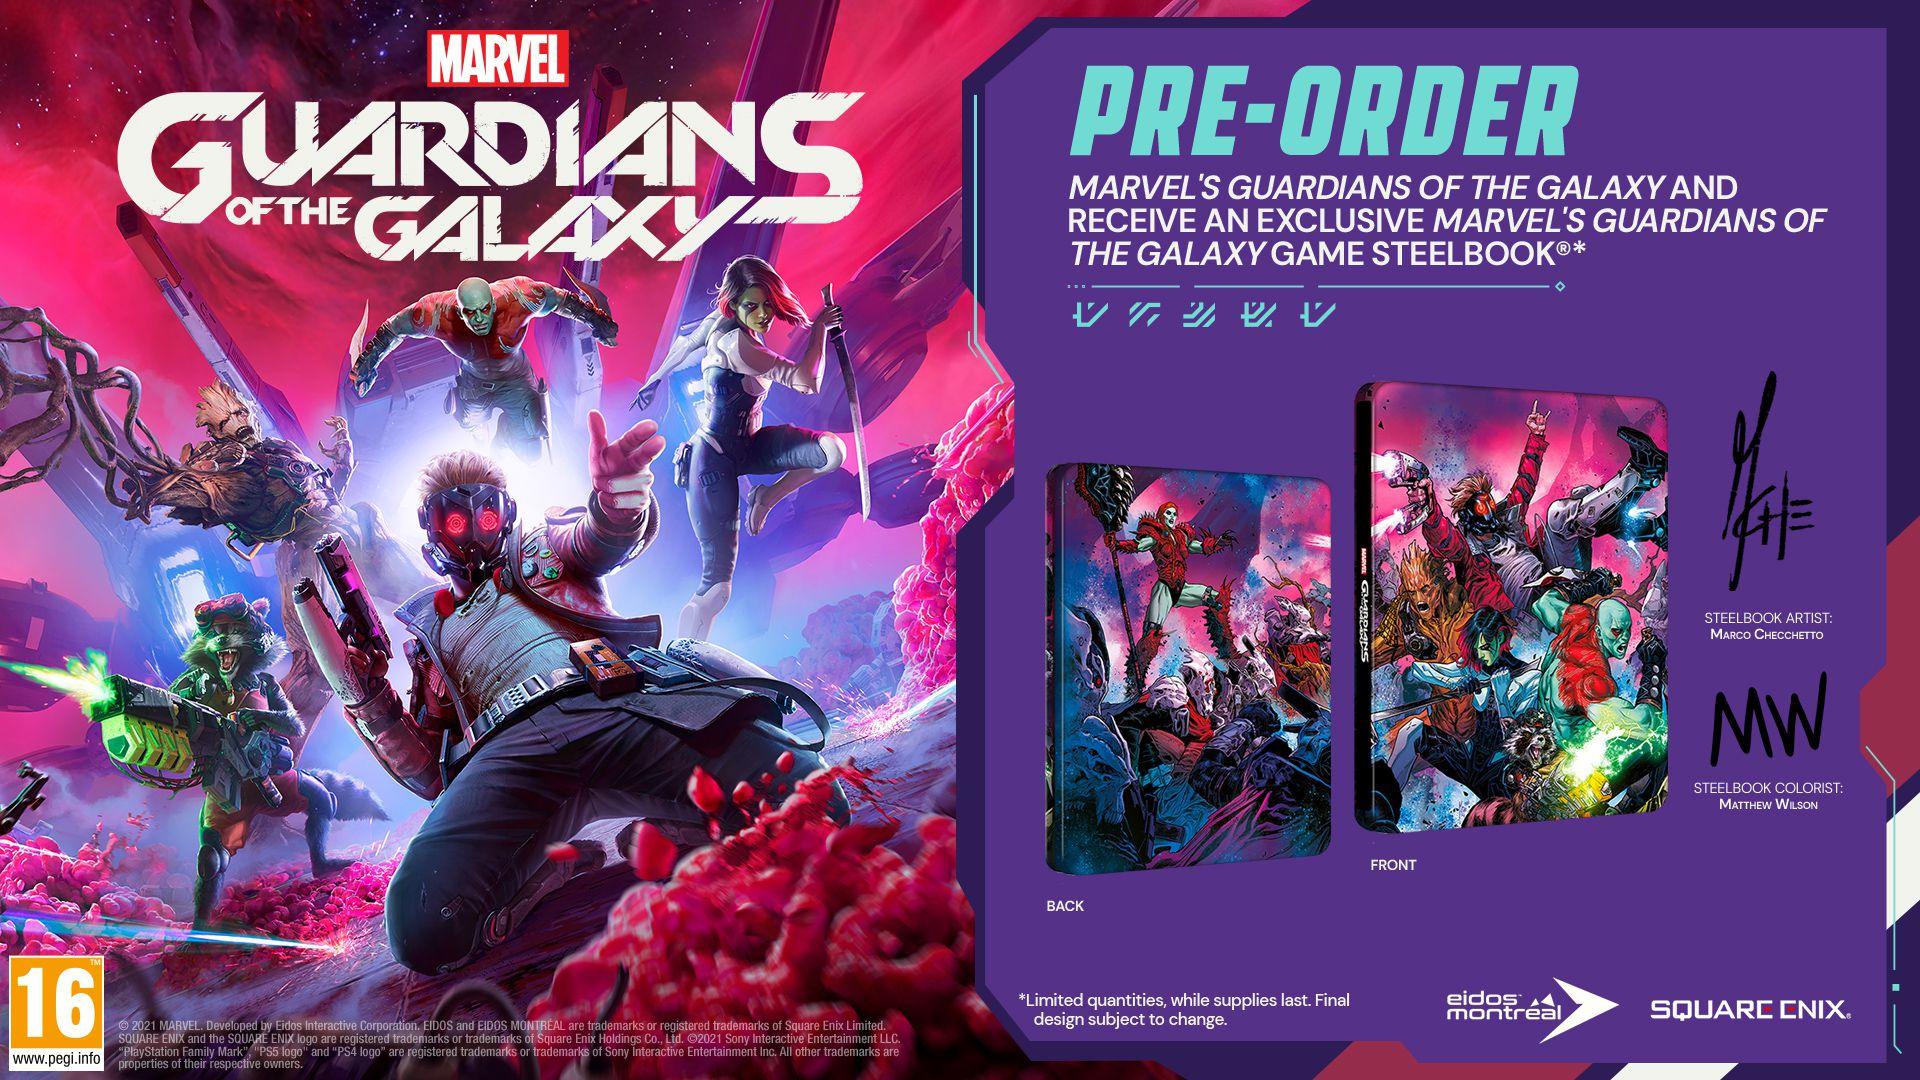 Marvels Guardians of the Galaxy Steelboo